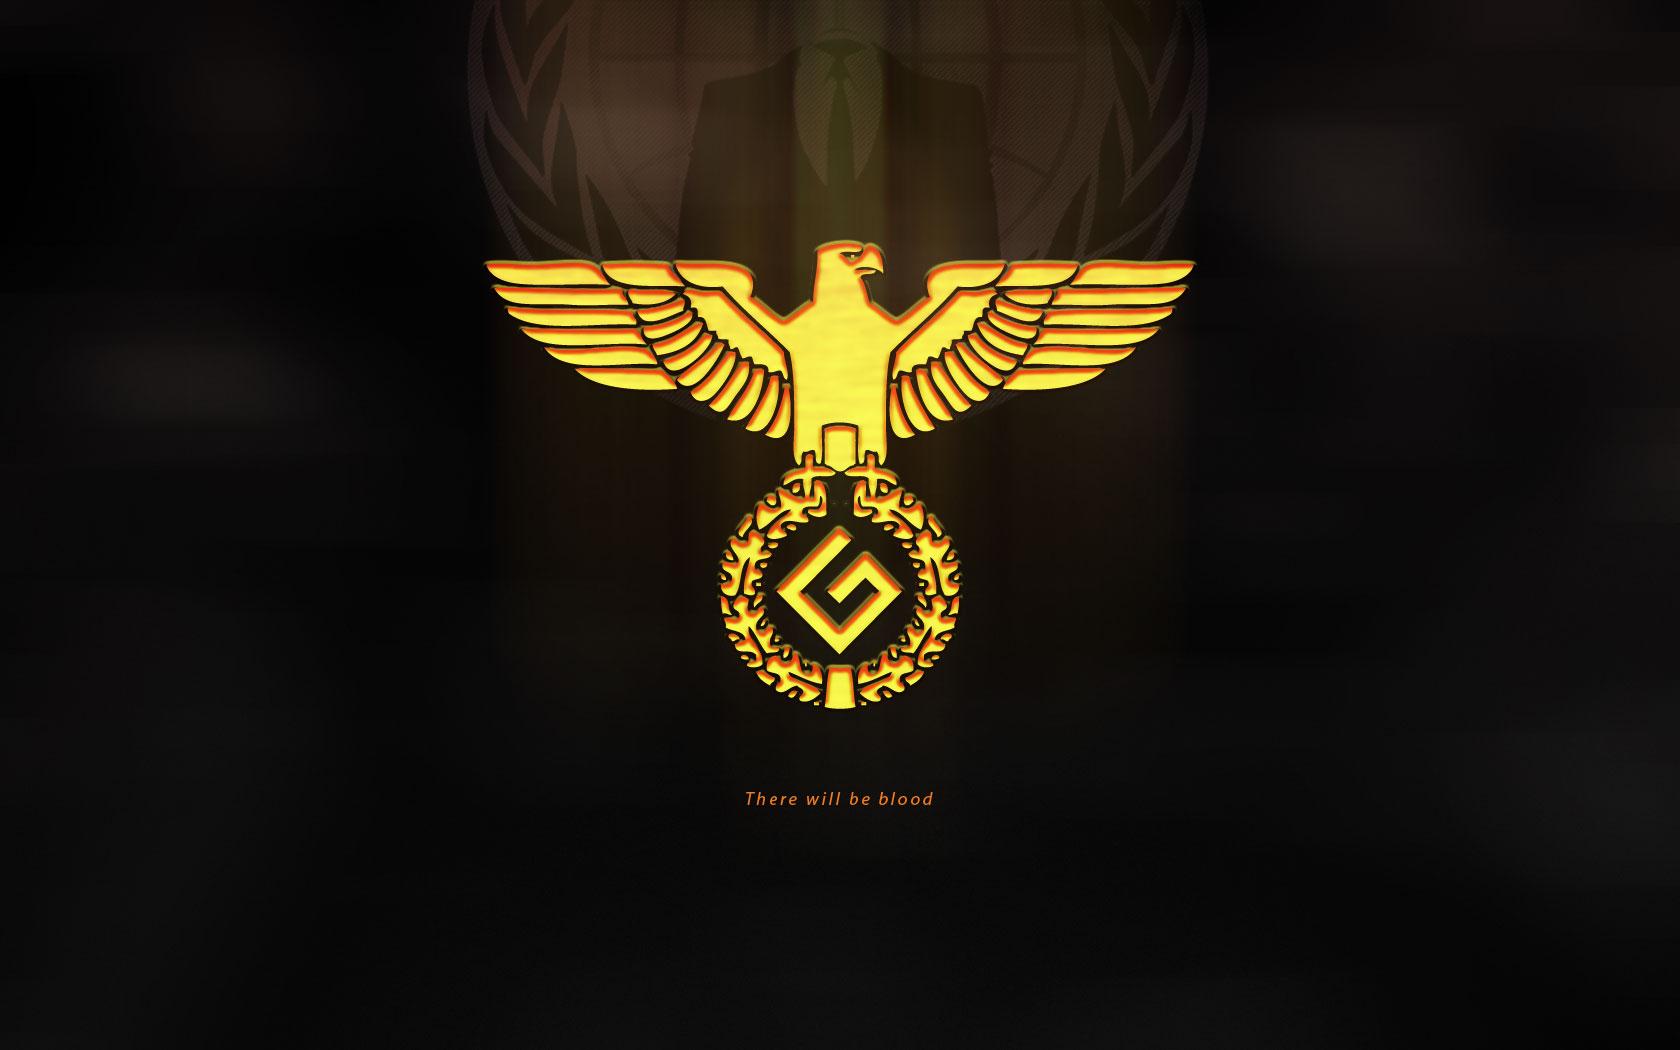 Download Nazi Grammar Wallpaper 1680x1050 Wallpoper 303013 1680x1050